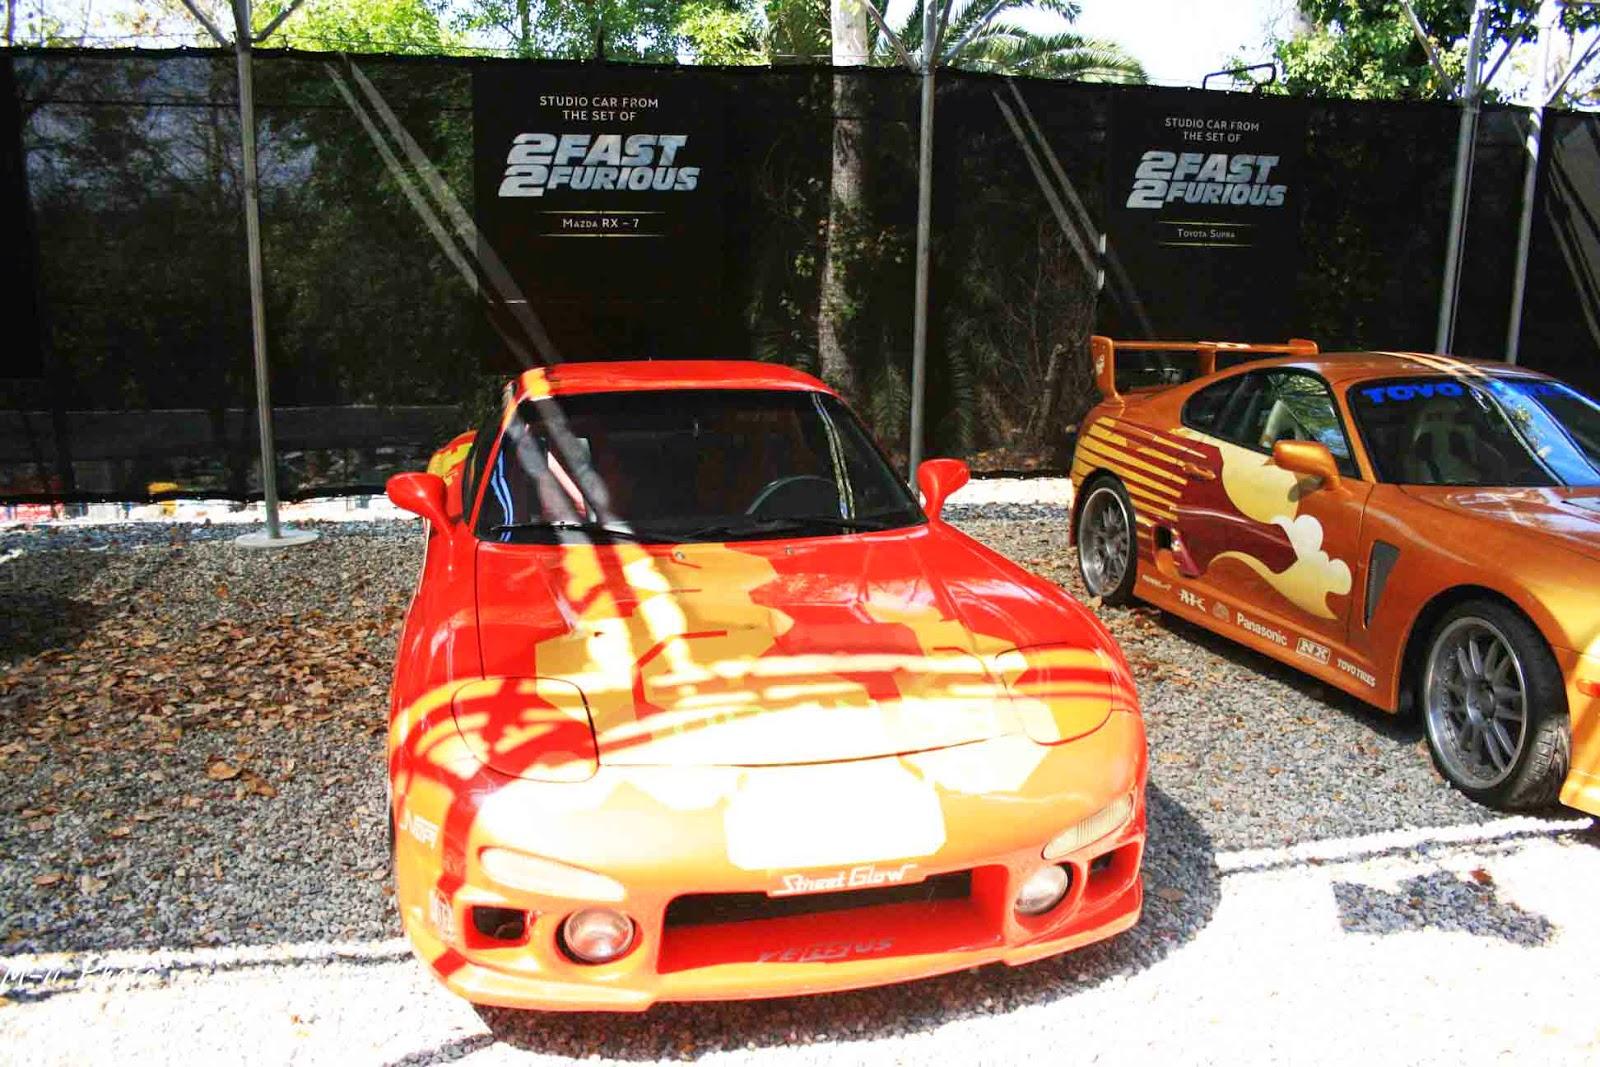 Les voitures de Fast & Furious Universal Studios Hollywood